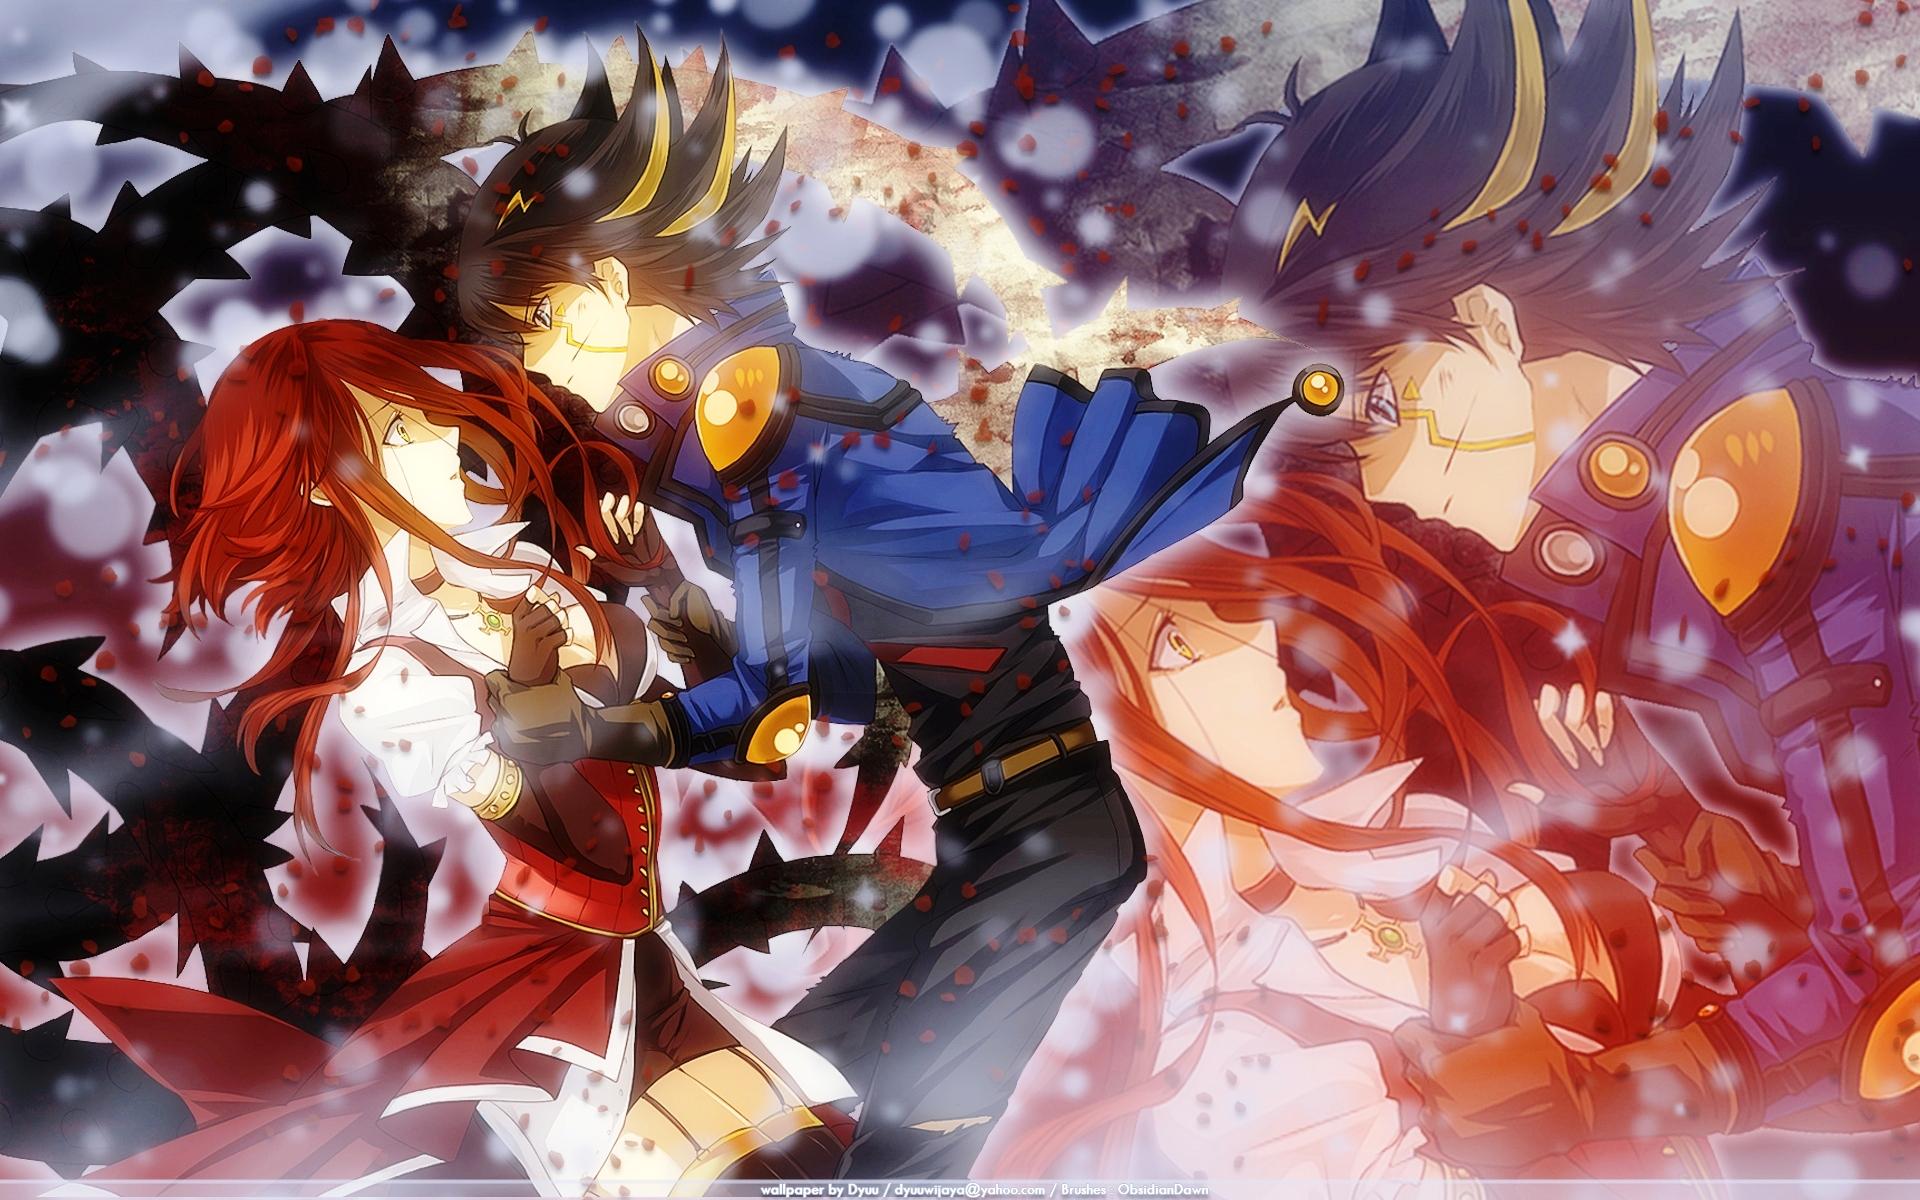 Yusei Fudo Wallpaper   Zerochan Anime Image Board 1920x1200